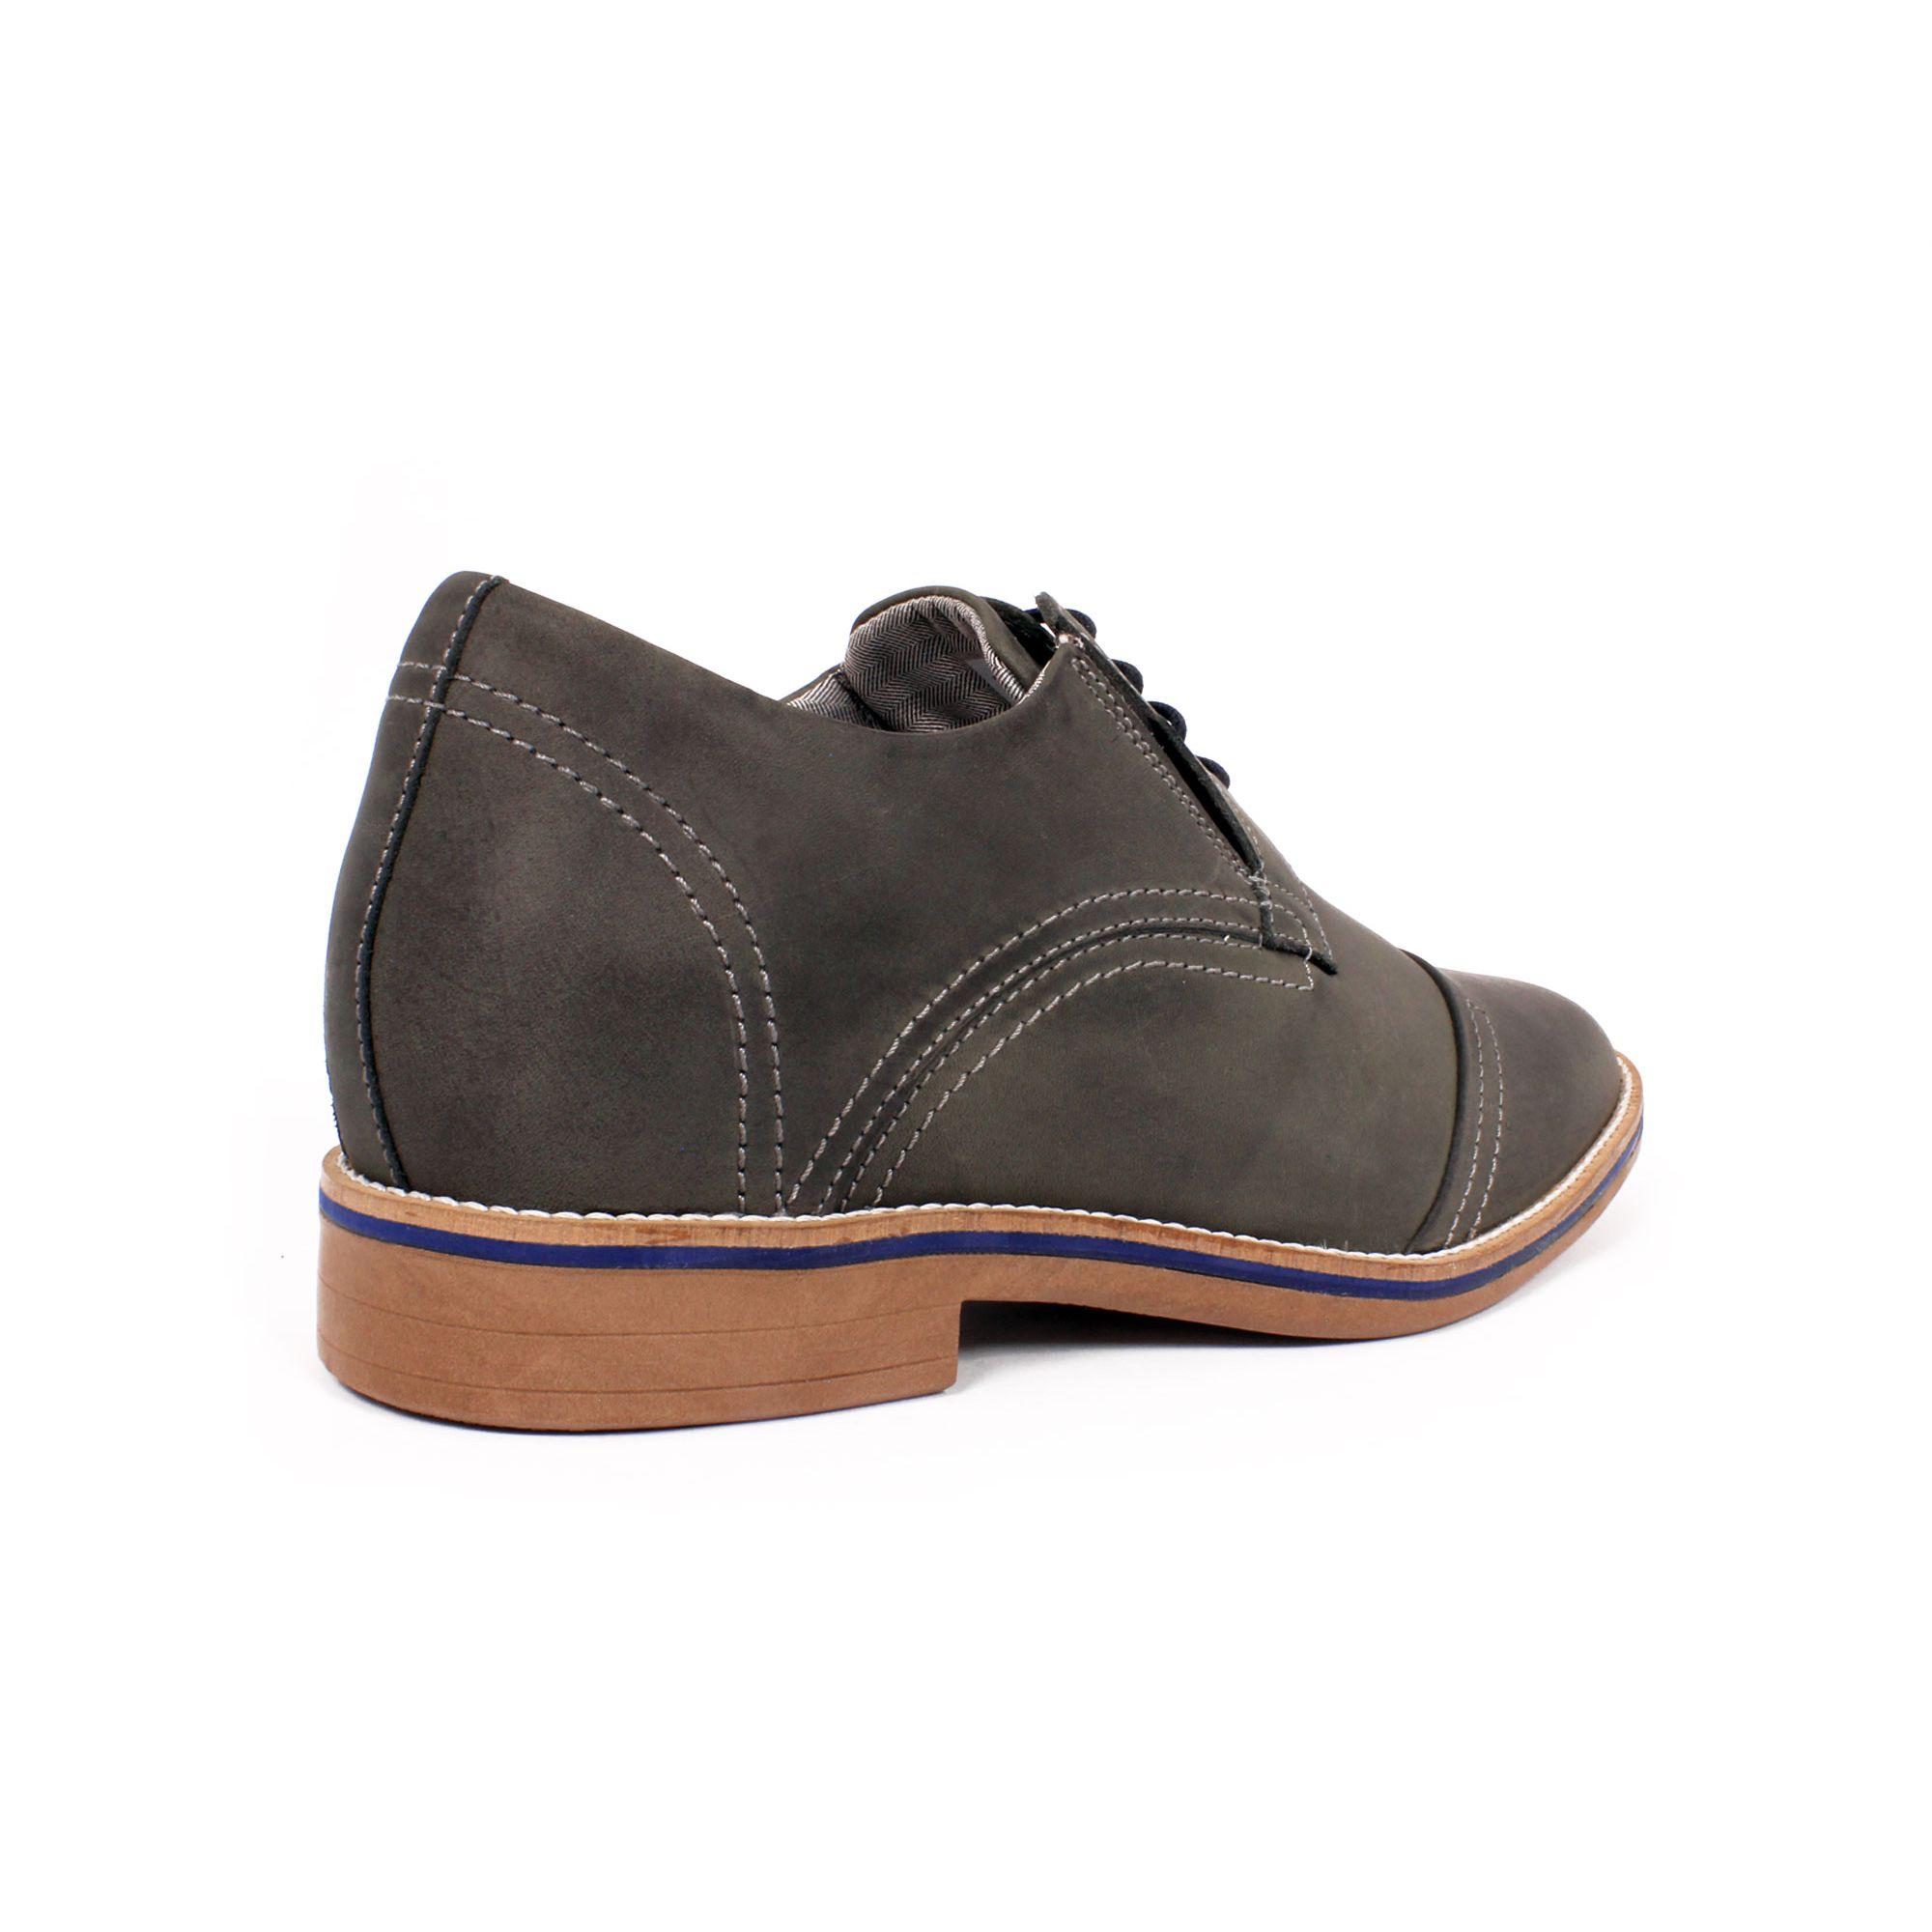 Zapato Casual Trend Gris Petroleo Max Denegri +7cms de Altura_70923